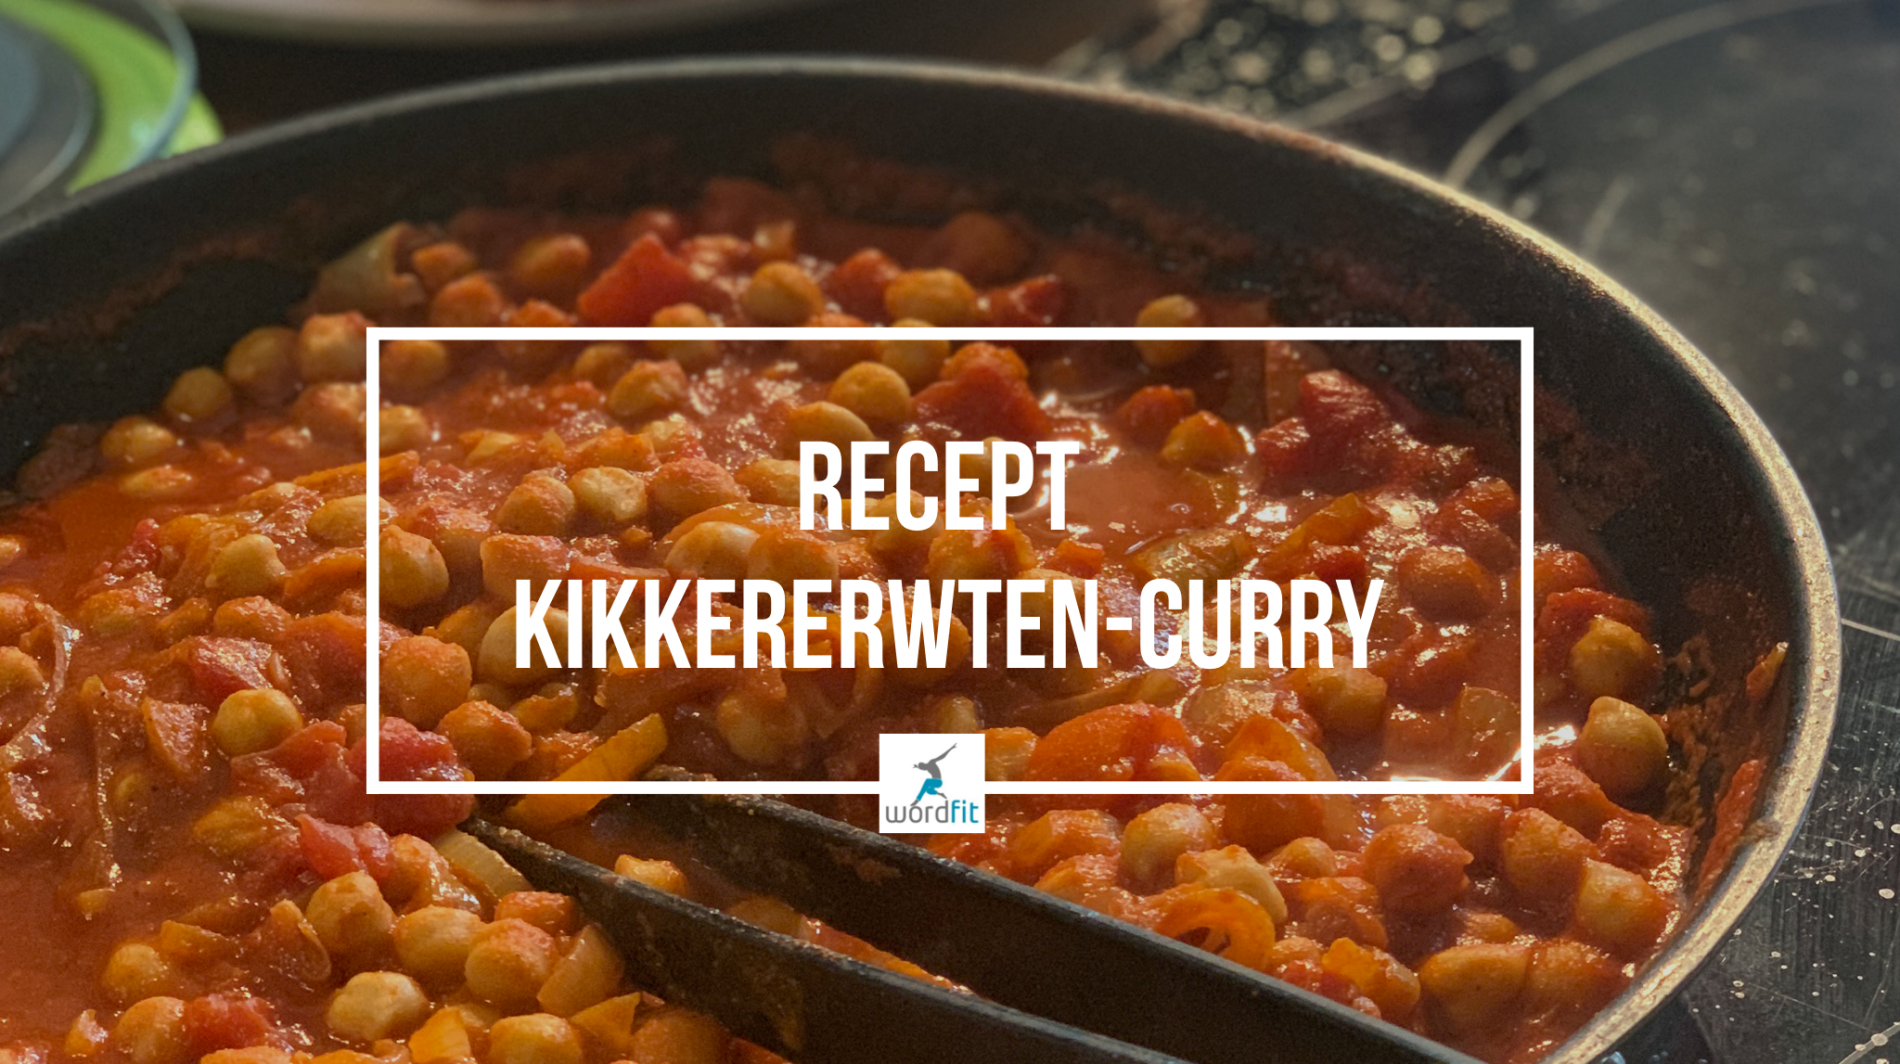 recept kikkererwten curry chana masala WordFit lifecoaching